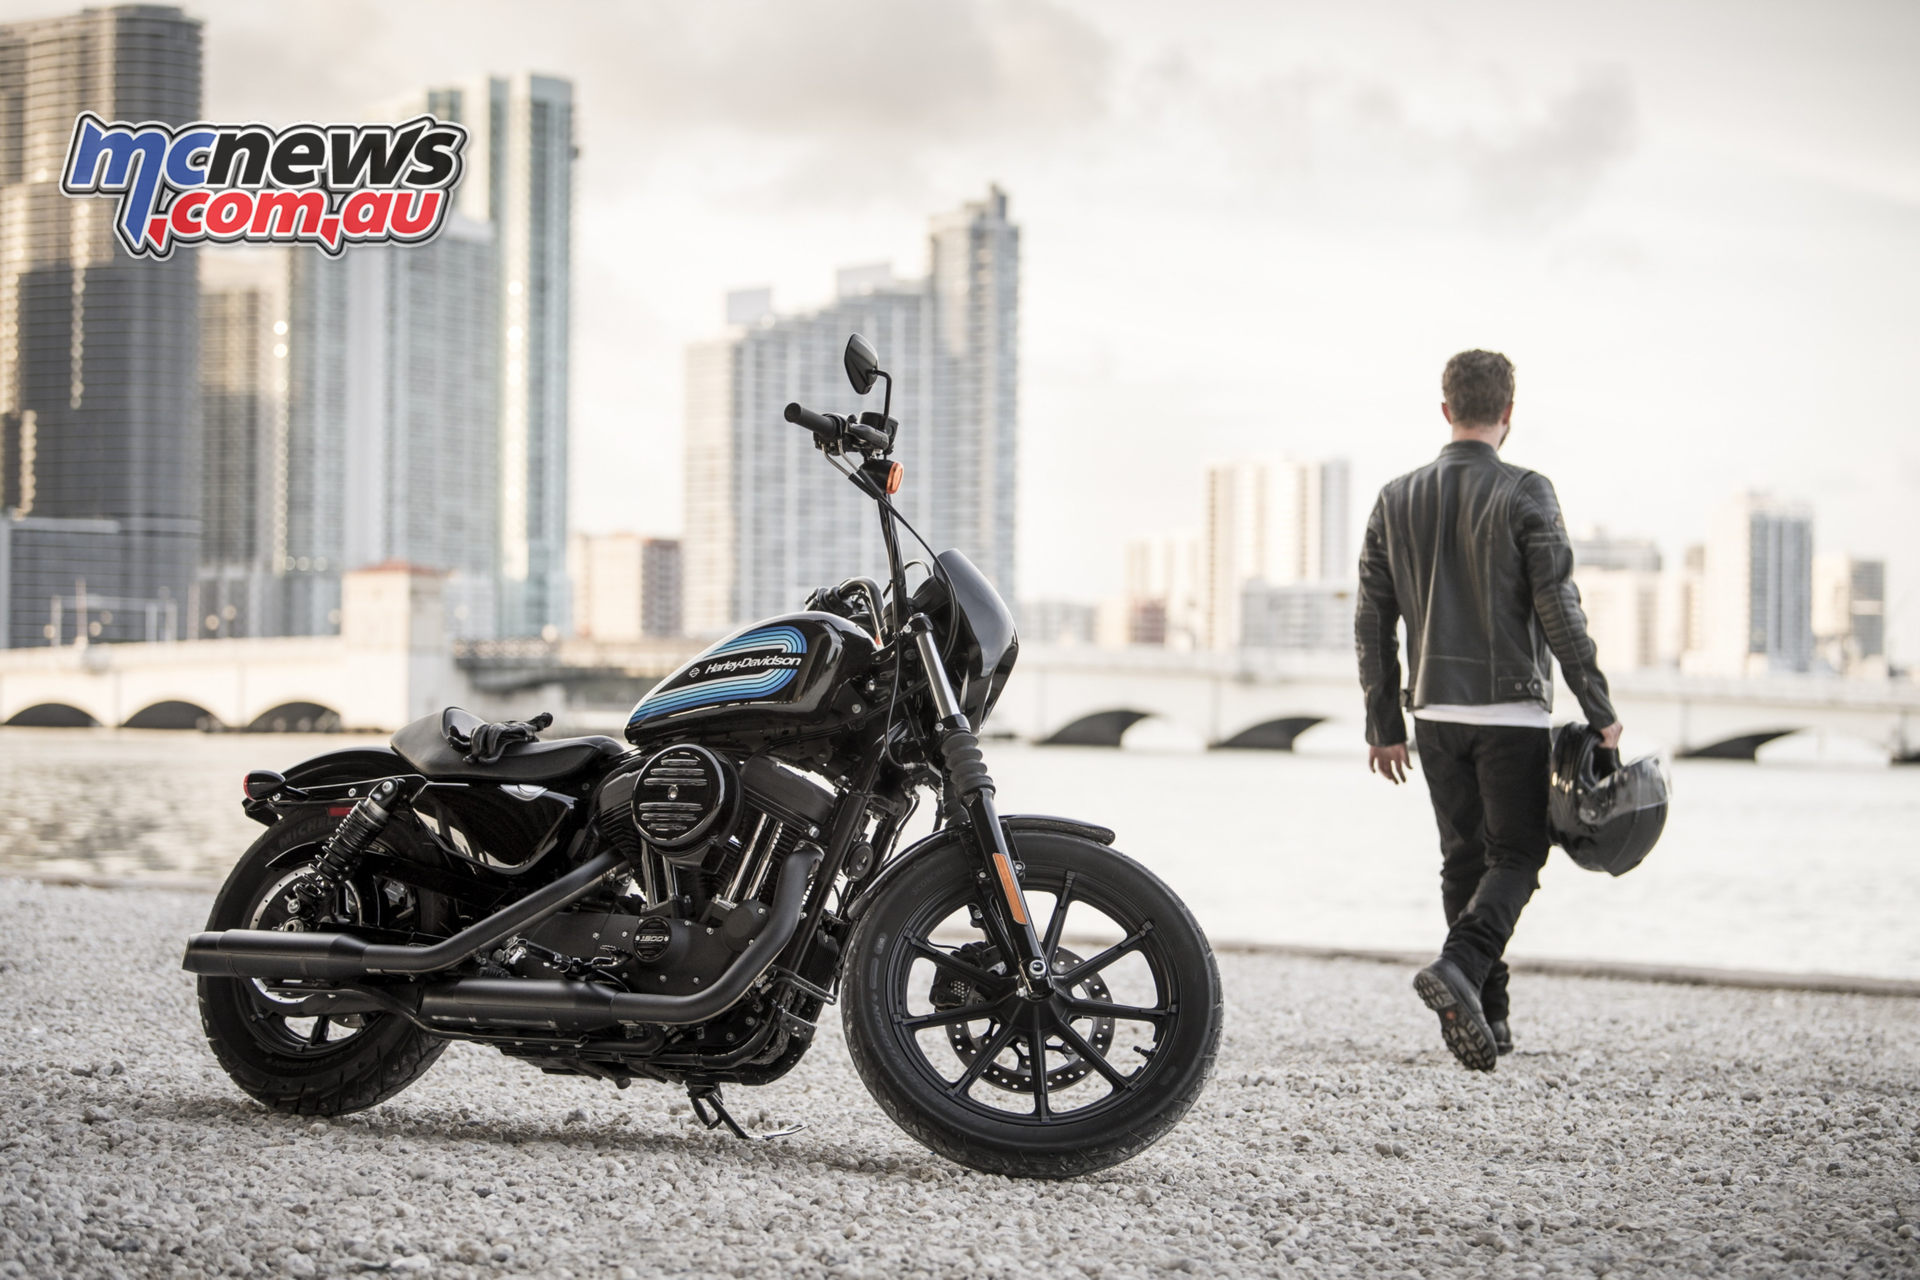 2018 Harley-Davidson Iron XL1200 Sportster